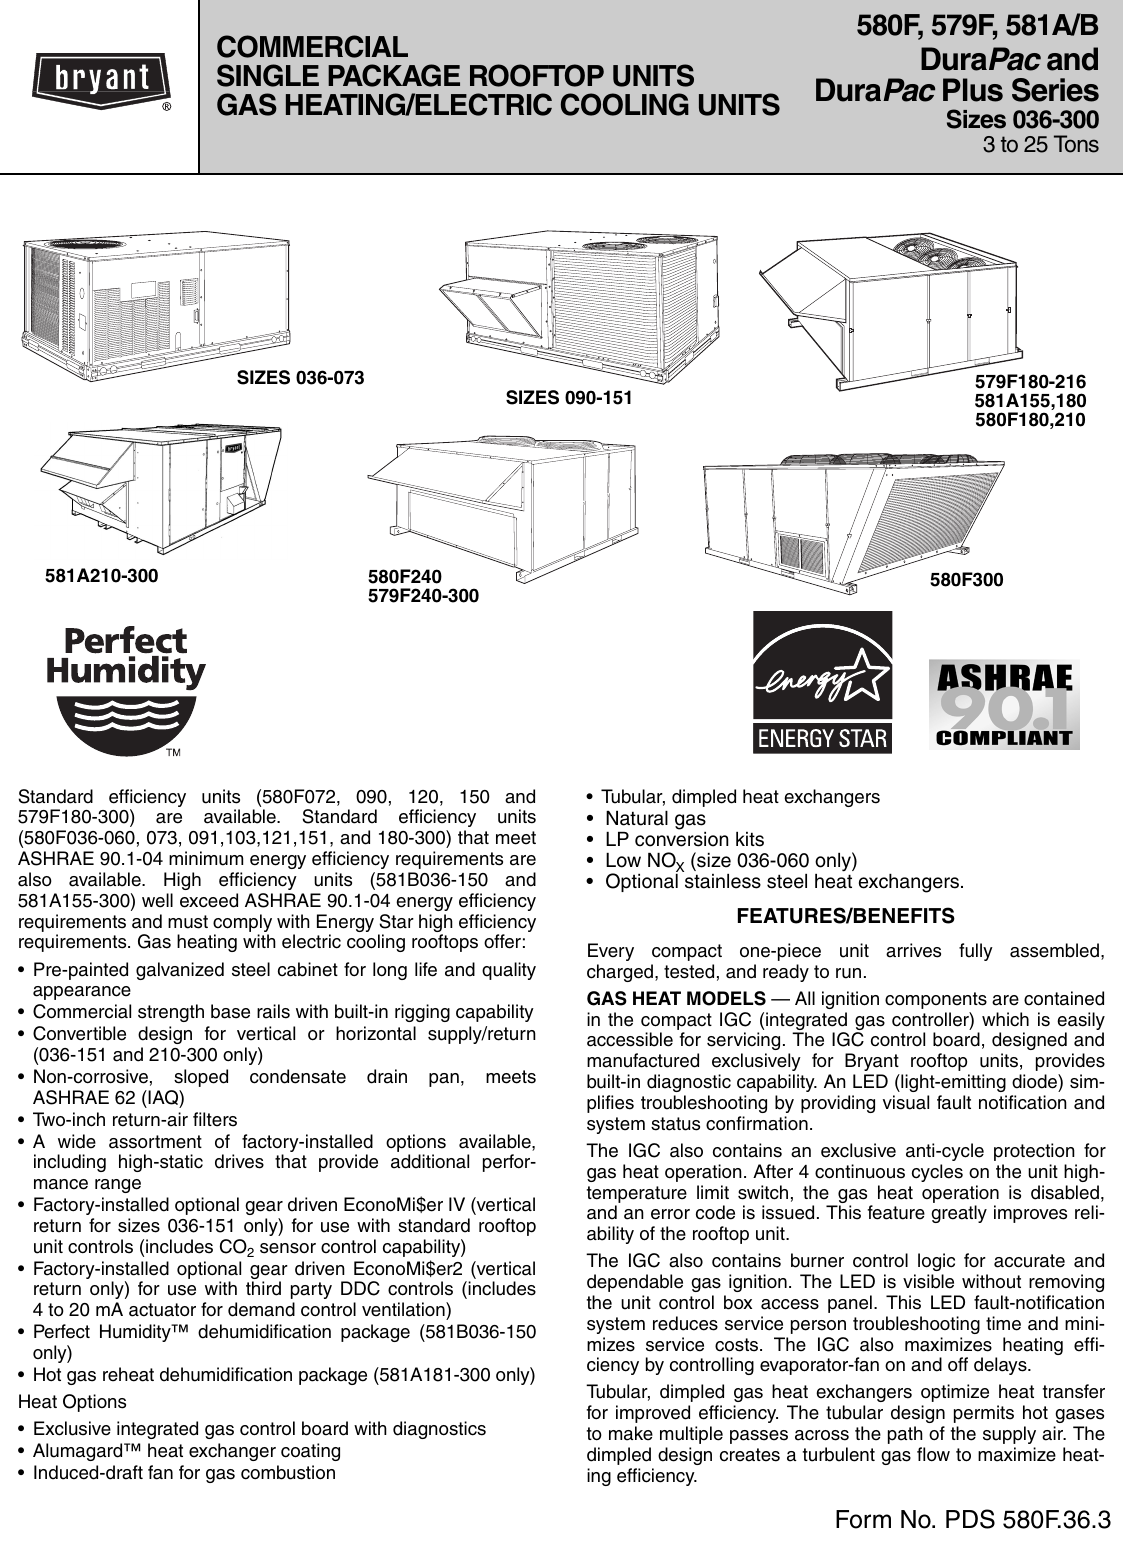 bryant furnace manual 794 daily instruction manual guides u2022 rh testingwordpress co